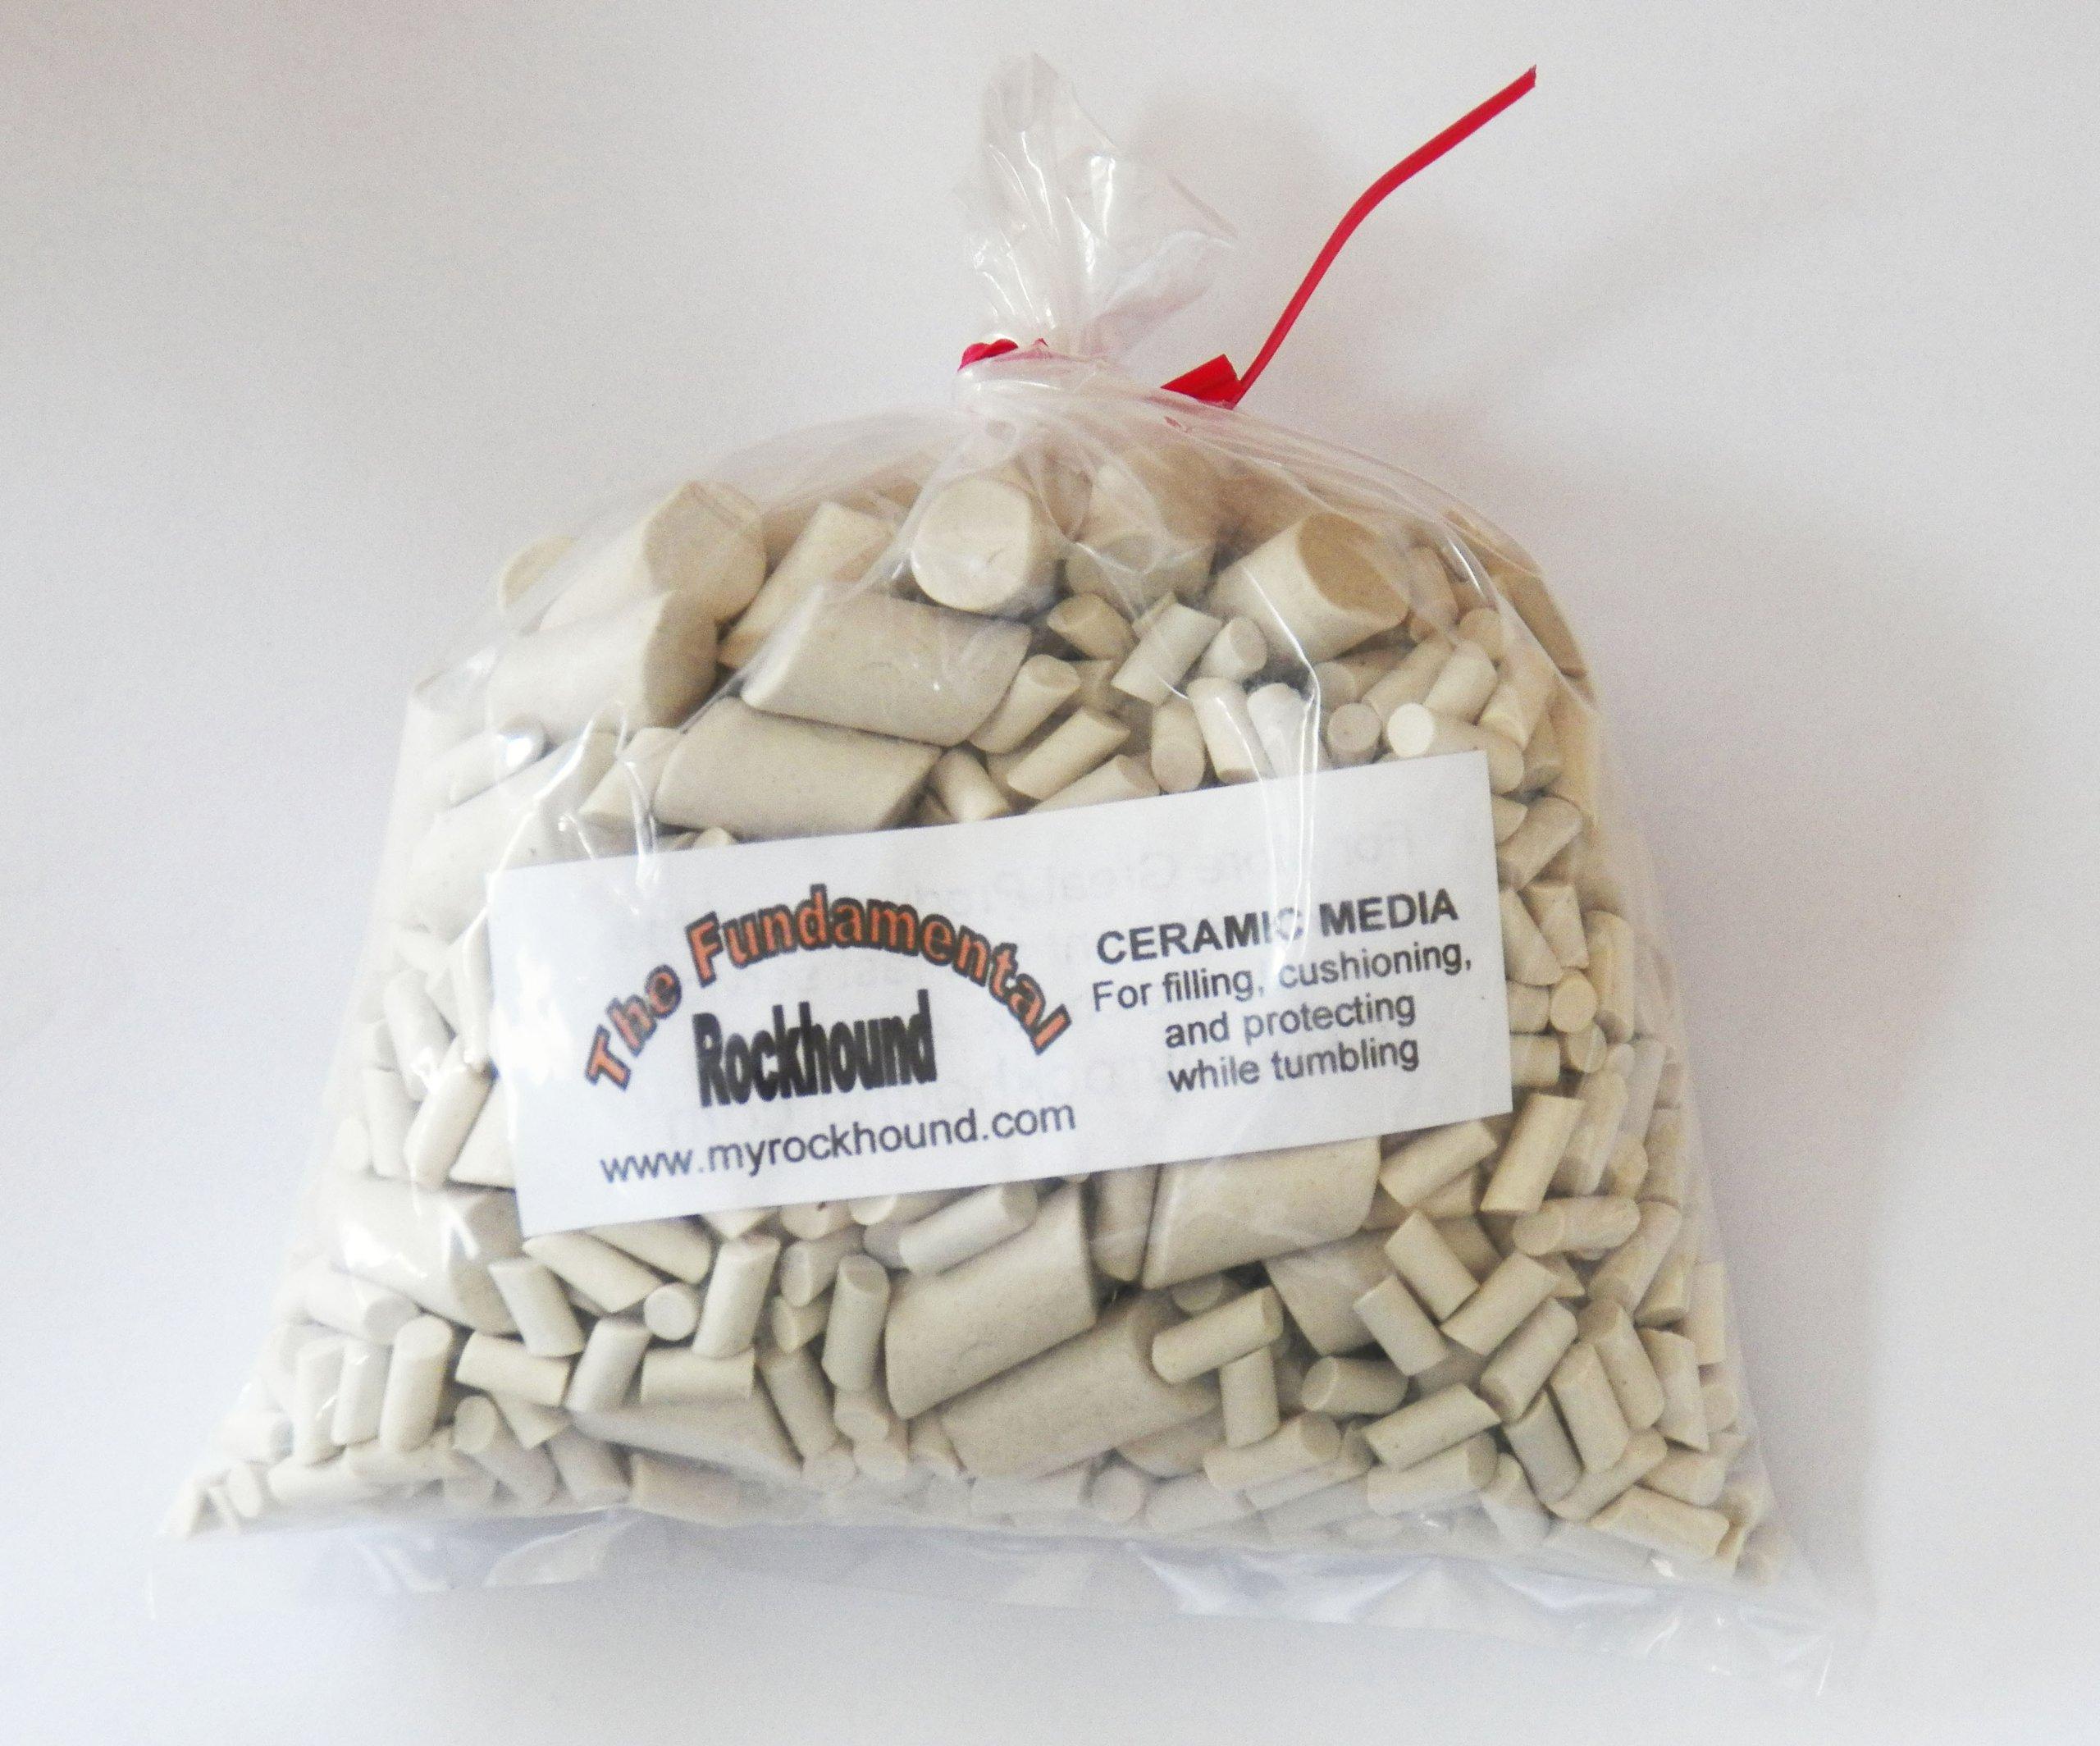 Fundamental Rockhound Products: 1 lb Mixed Ceramic Tumbling Media for Rock Filler, Cushioning, Protecting